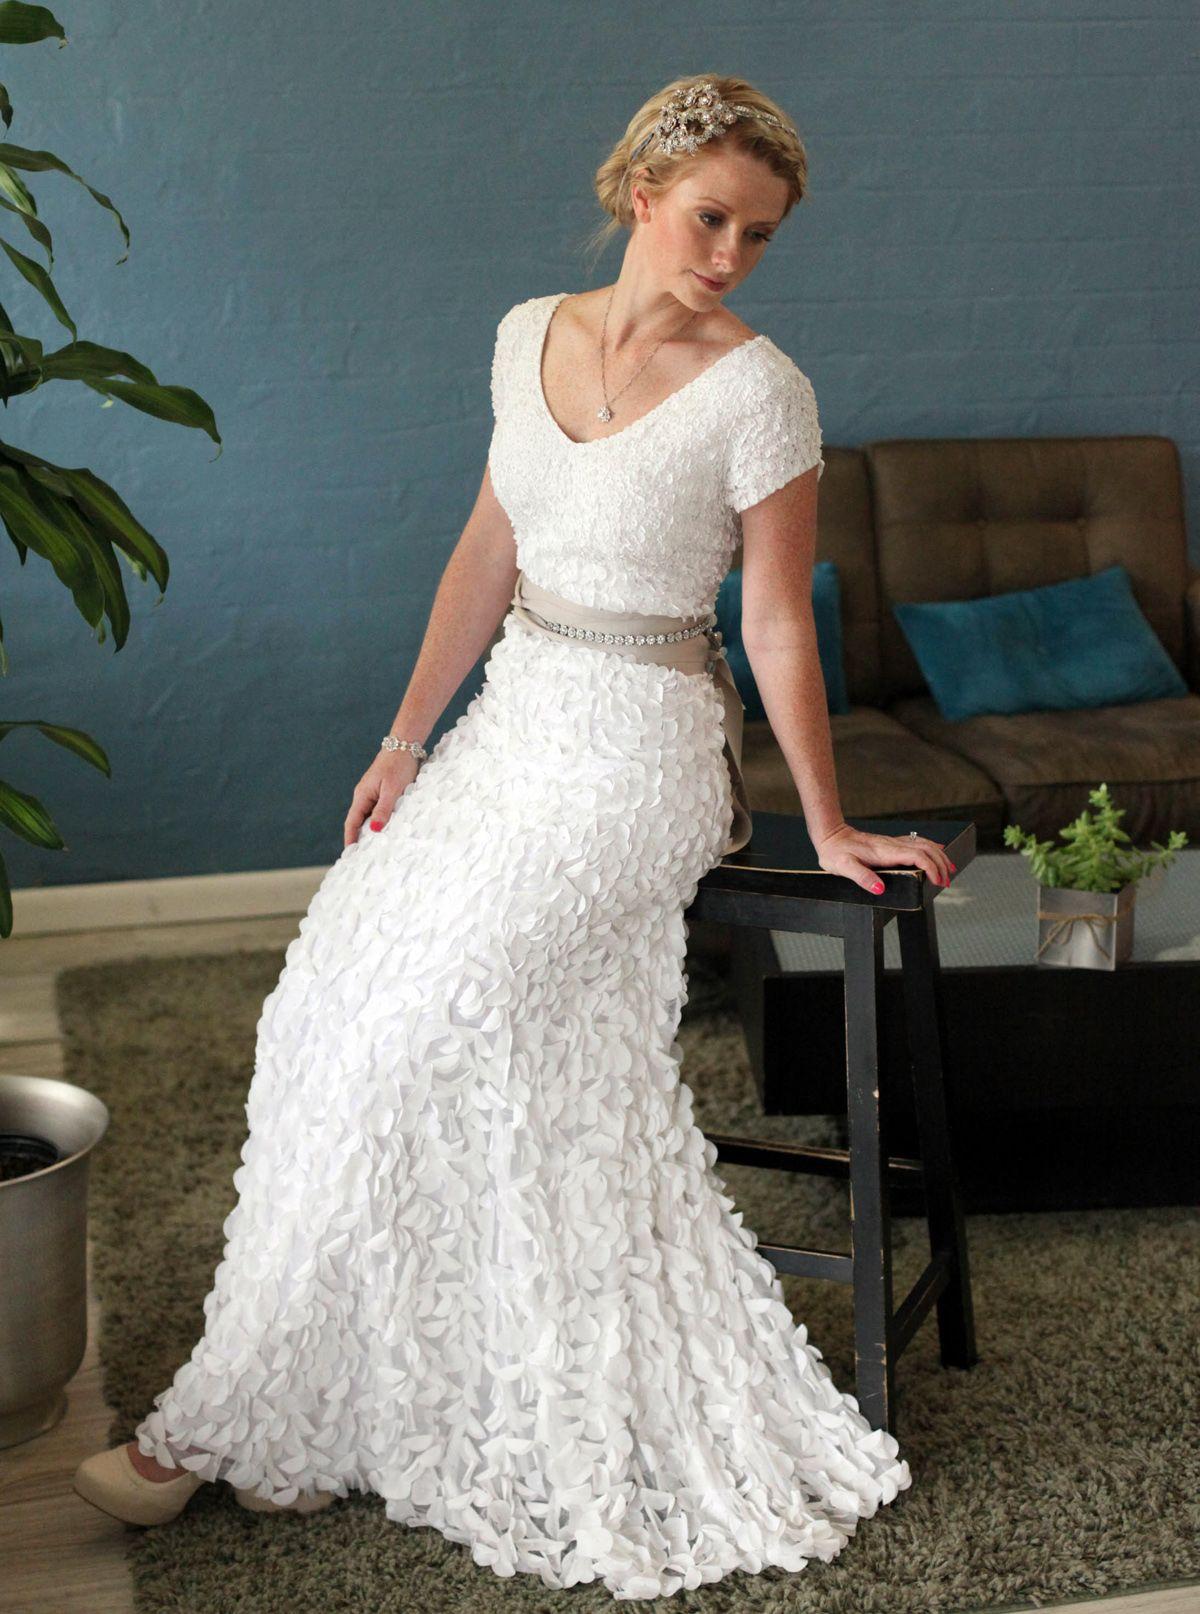 conservative wedding dress Stunning Texture Modest Wedding Gown Not so big on the hair but lovee